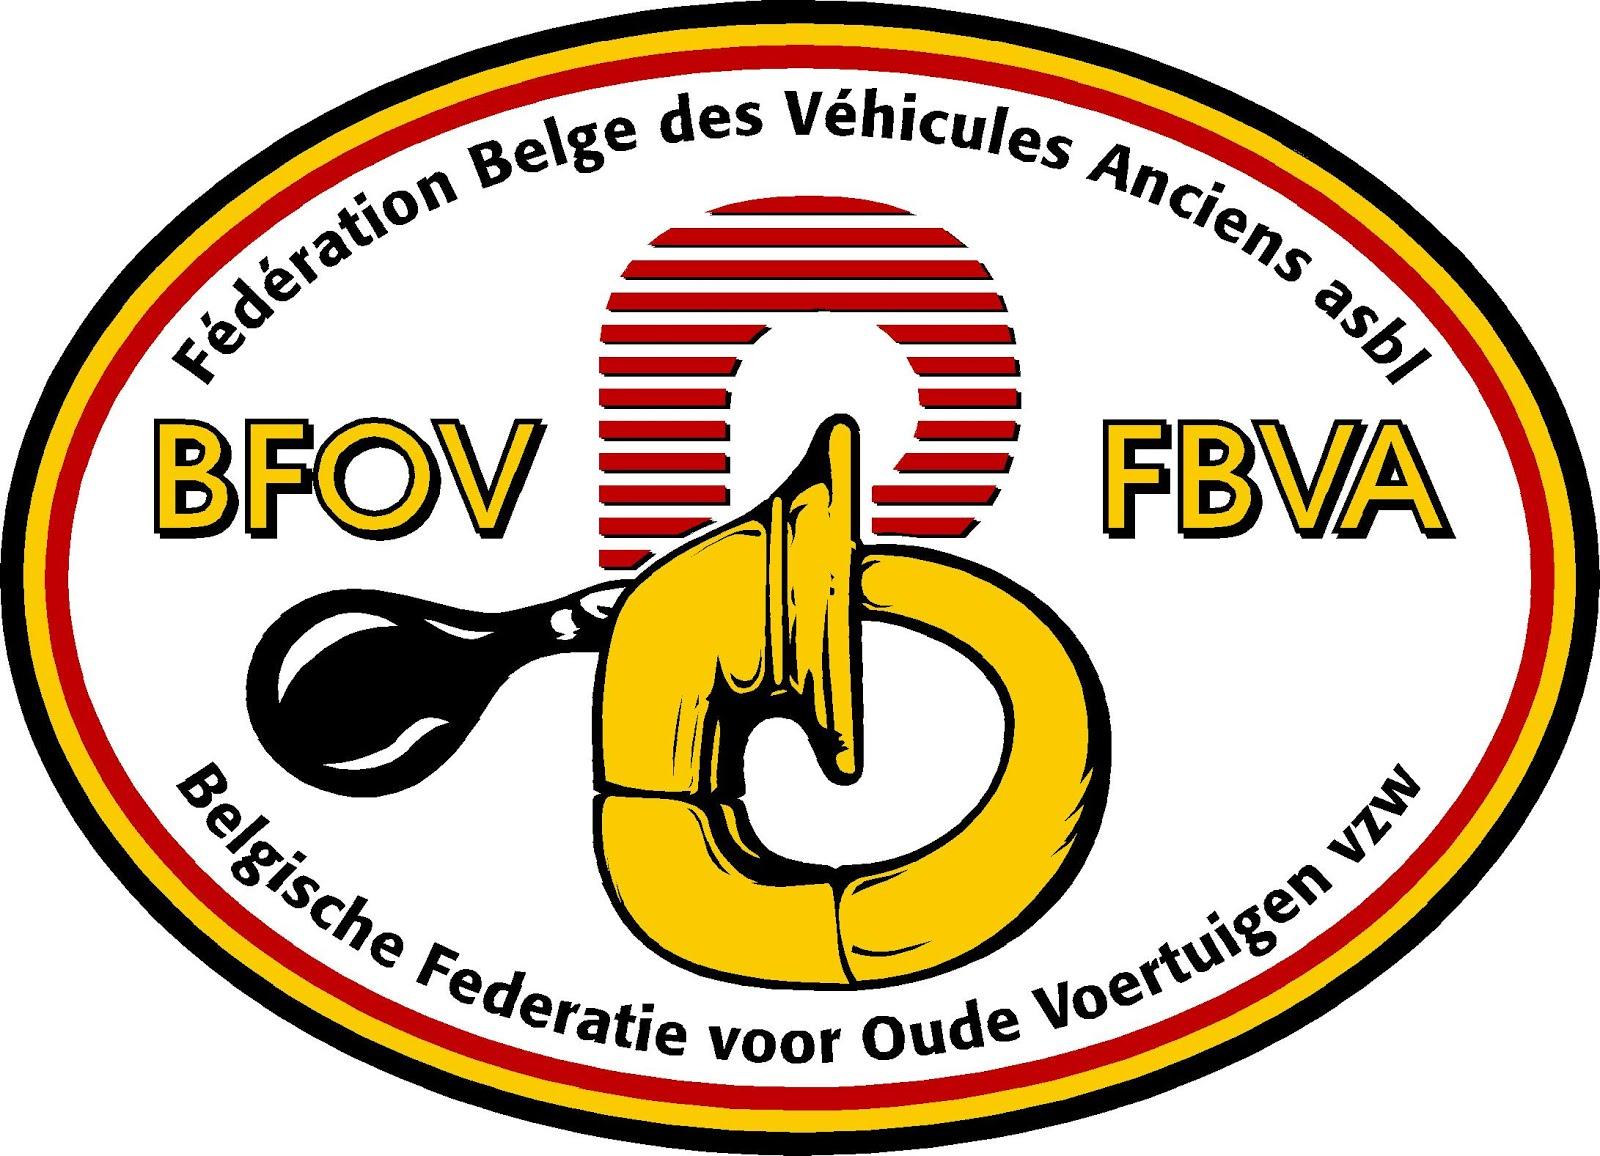 Fédération Belge des Véhicules Anciens www.fbva.be